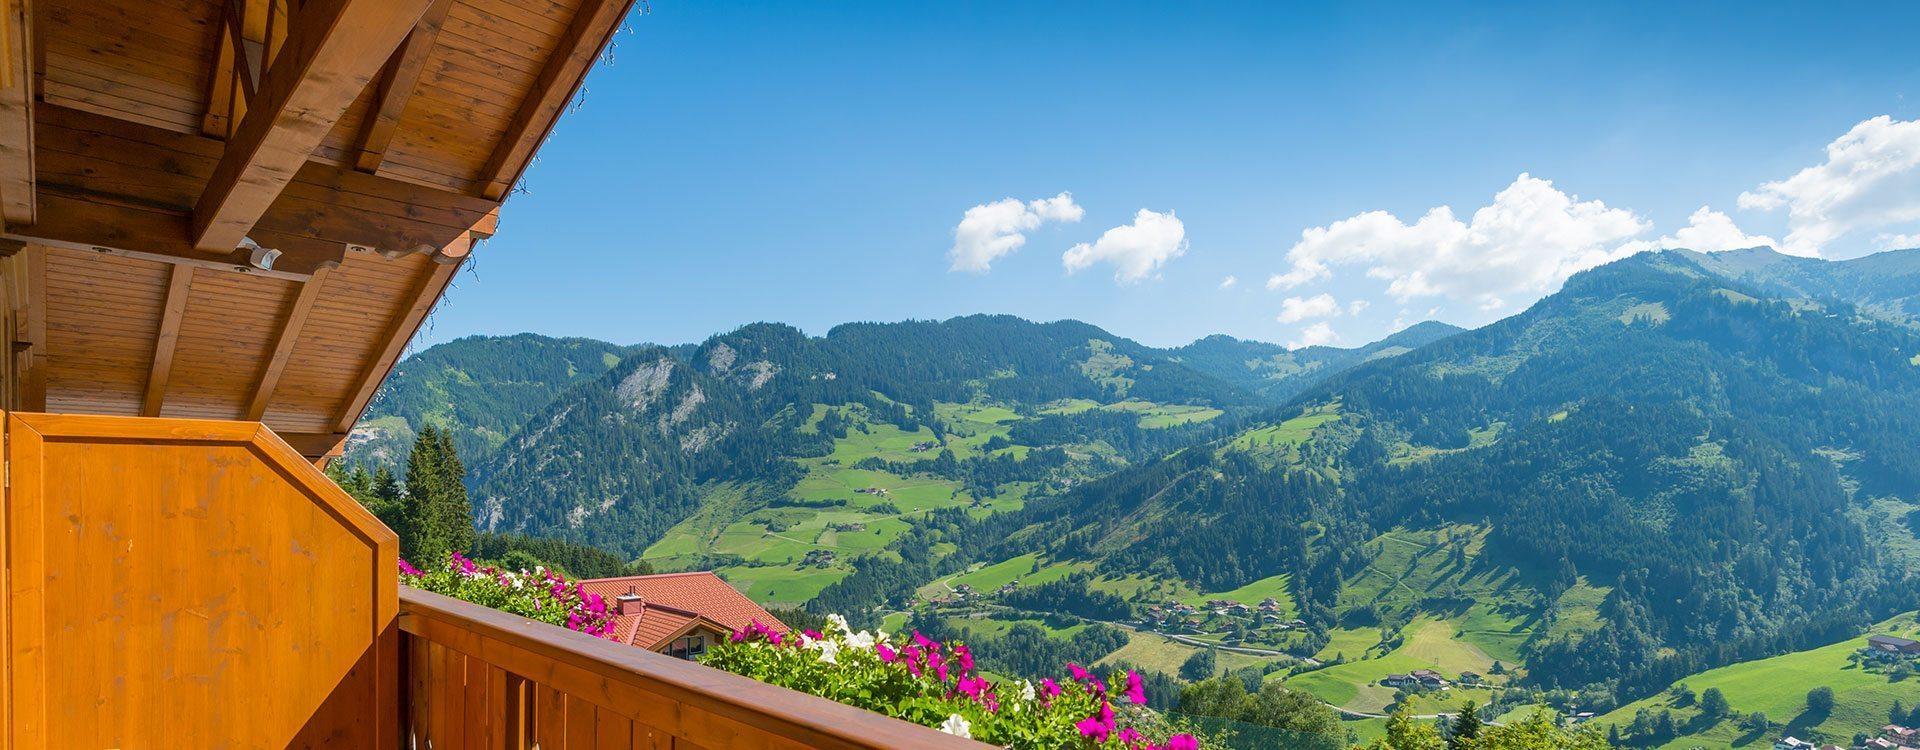 Panorama-Lage in den Bergen - Hotel & Berggasthaus in Großarl